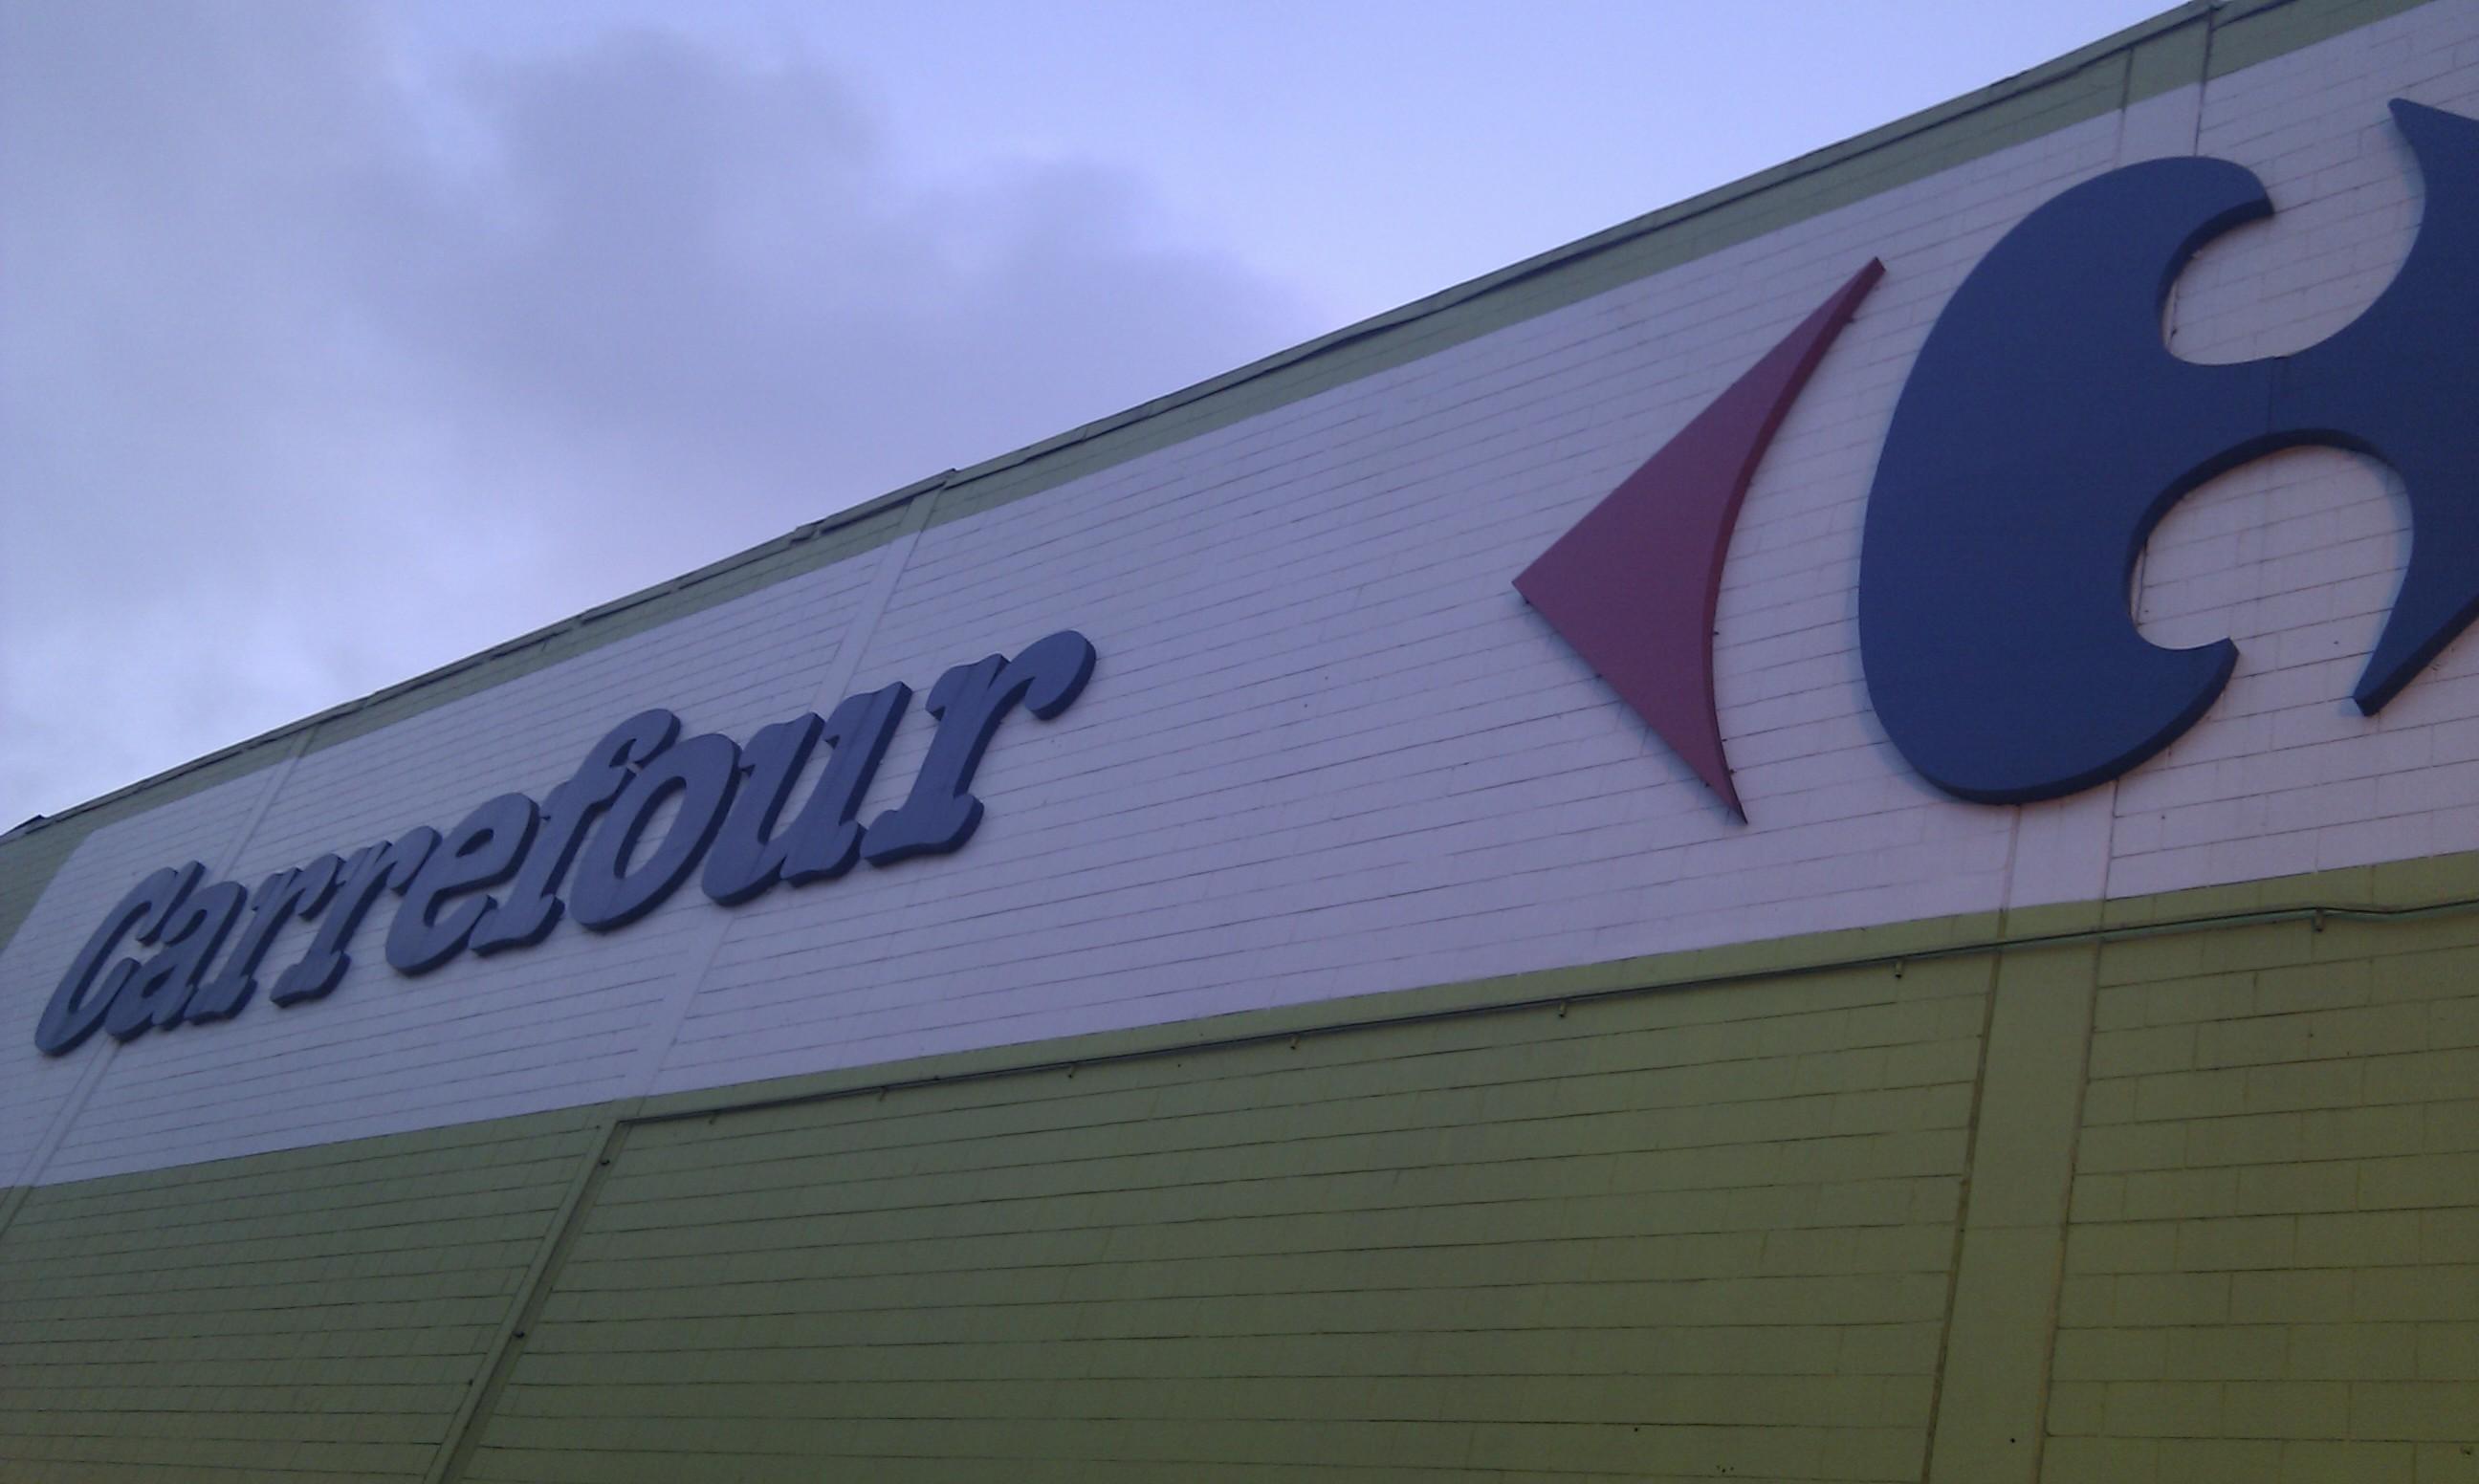 Carrefour Supermarket